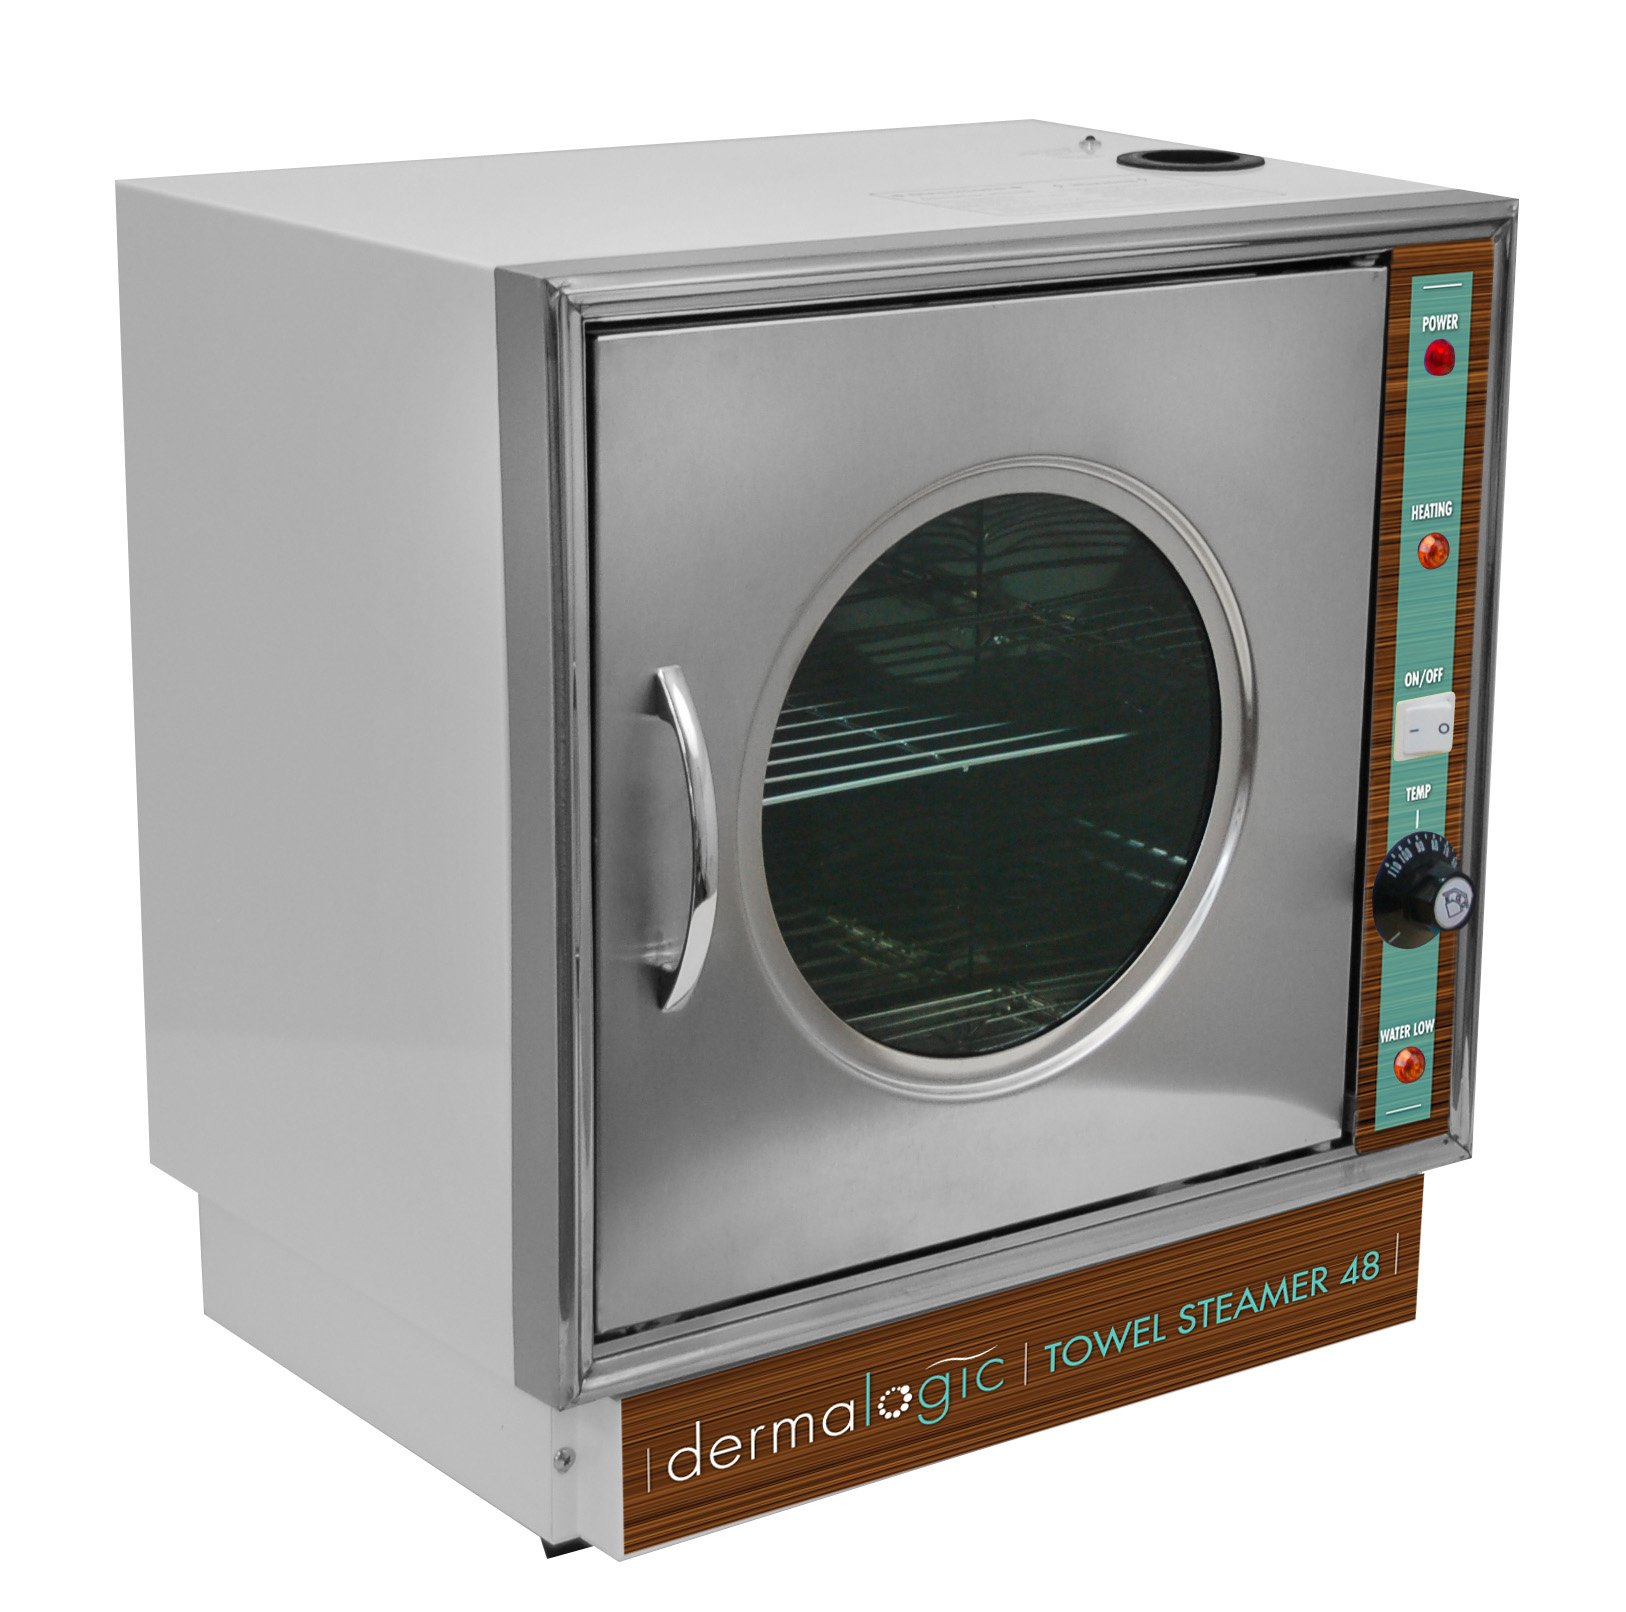 DERMALOGIC Towel Steamer 48 Massage Parlor Barber Shop Beauty Nail Salon Furniture Equipment by DERMALOGIC